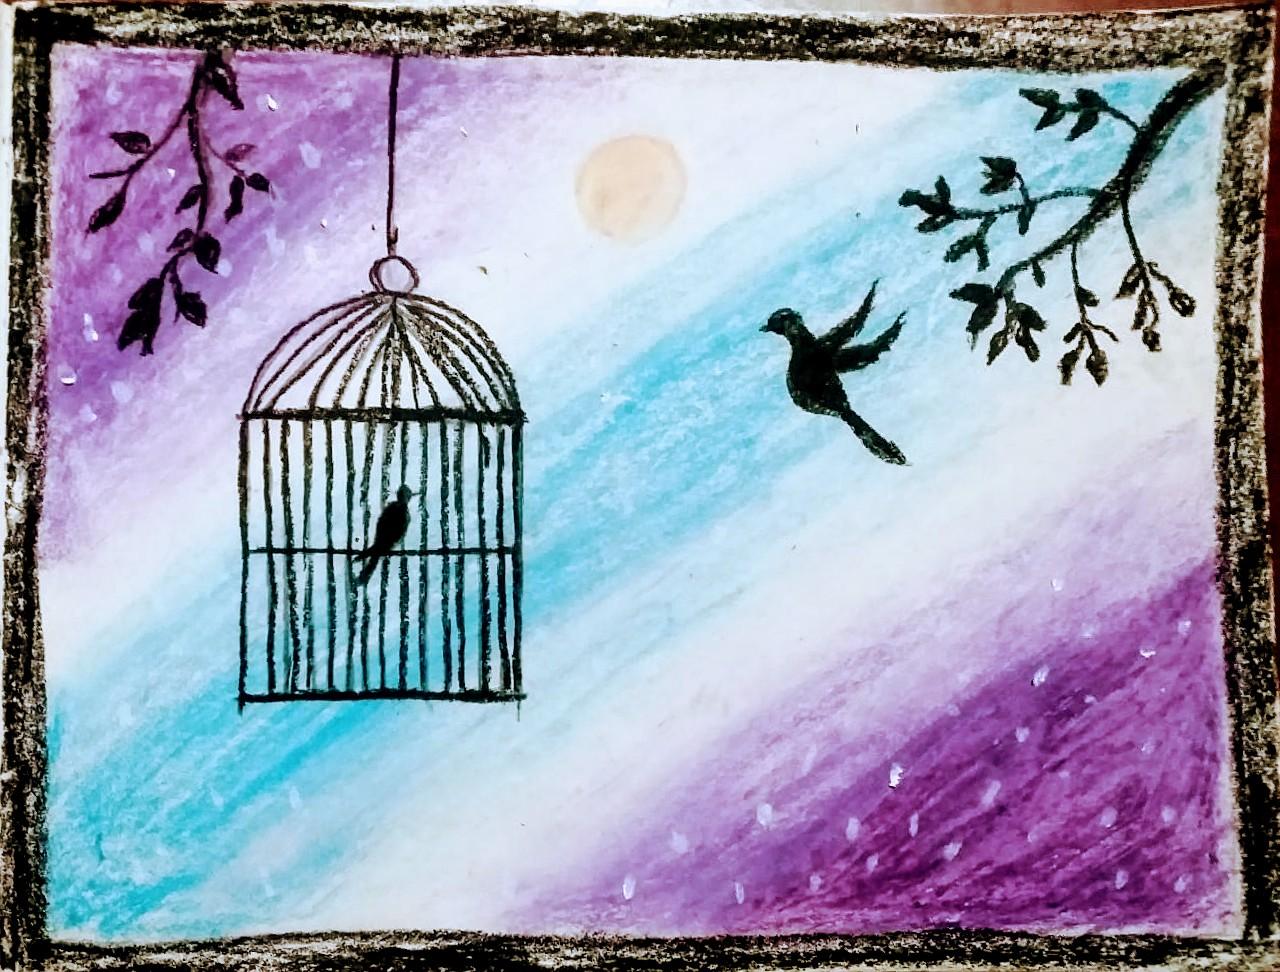 Birds want freedom Slider 1/3